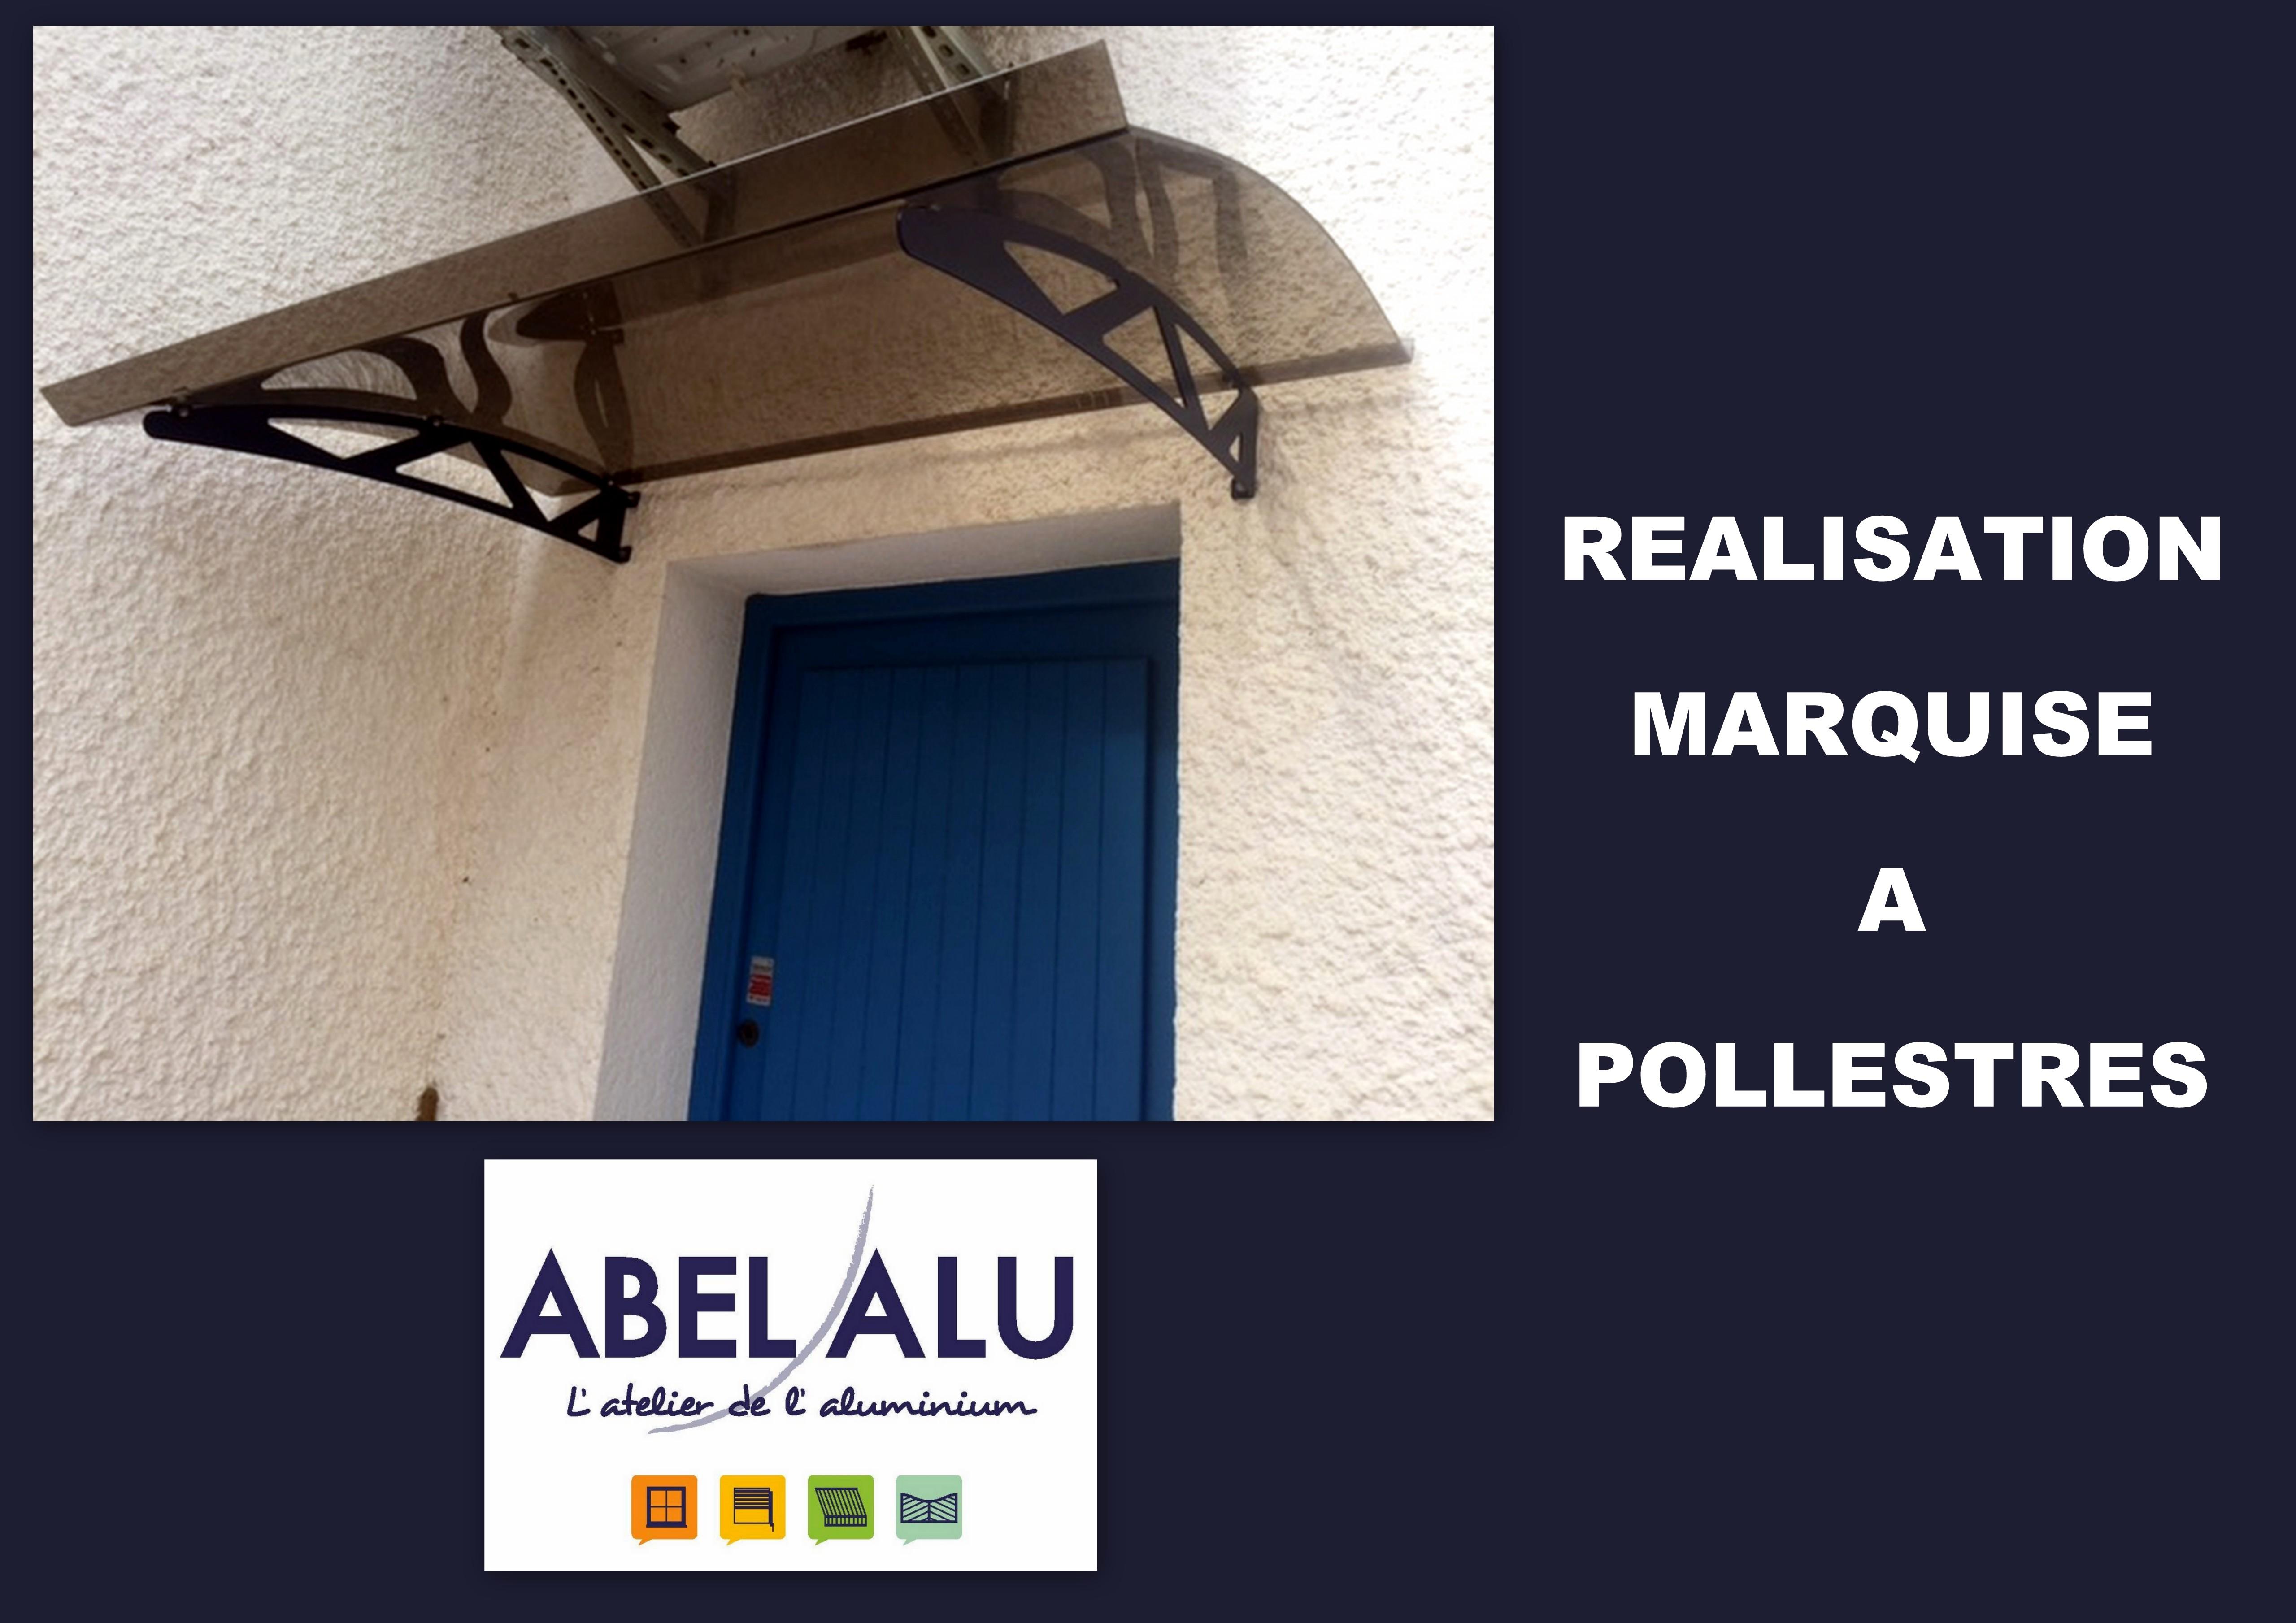 ABEL ALU - MARQUISE - POLLESTRES